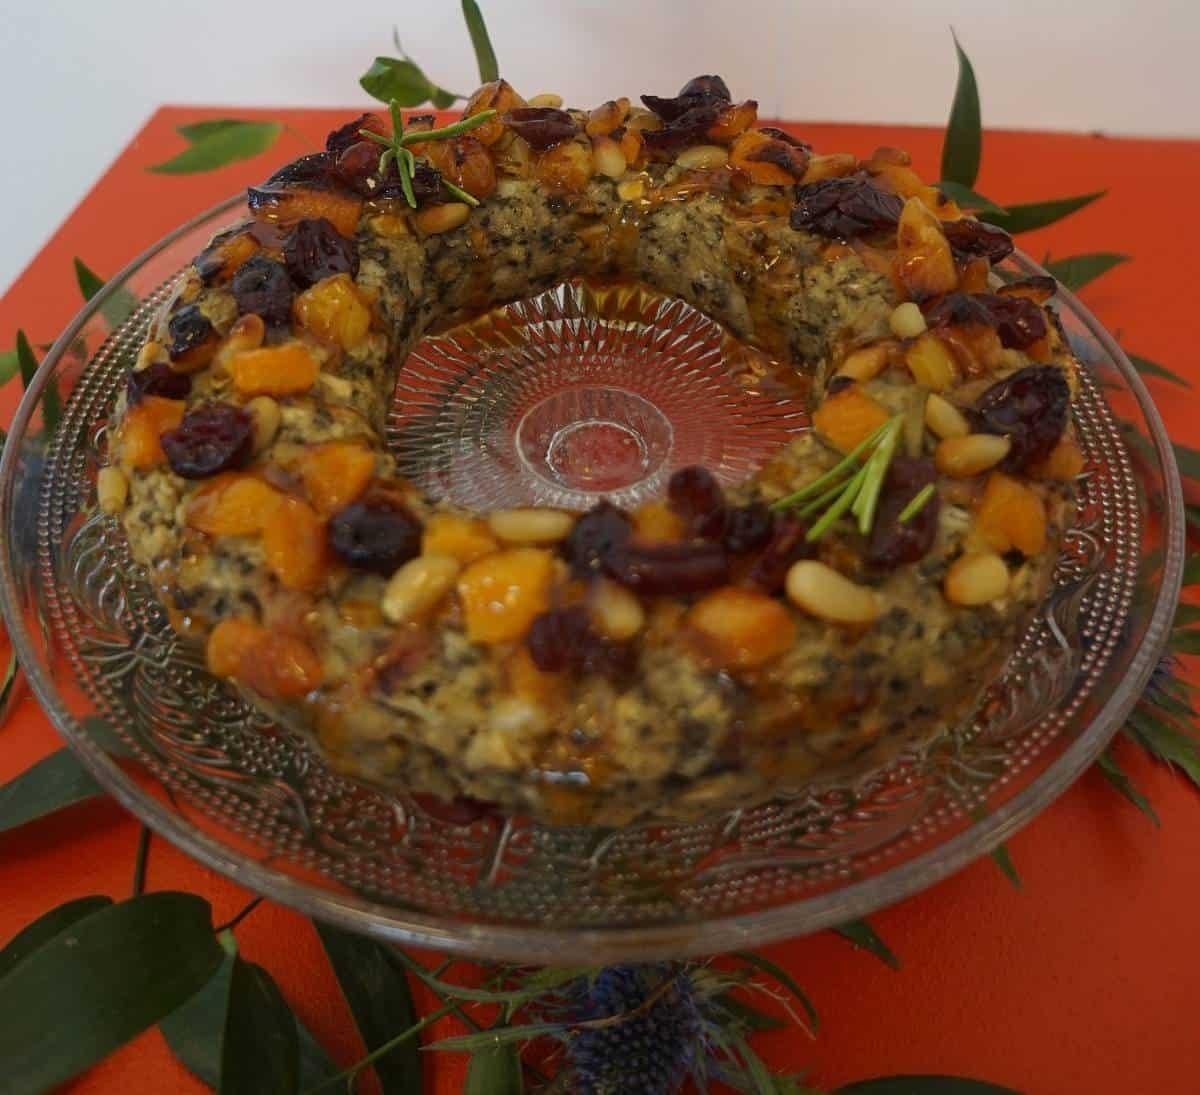 Vegan Festive Stuffing Wreath with Pomegranate Glaze